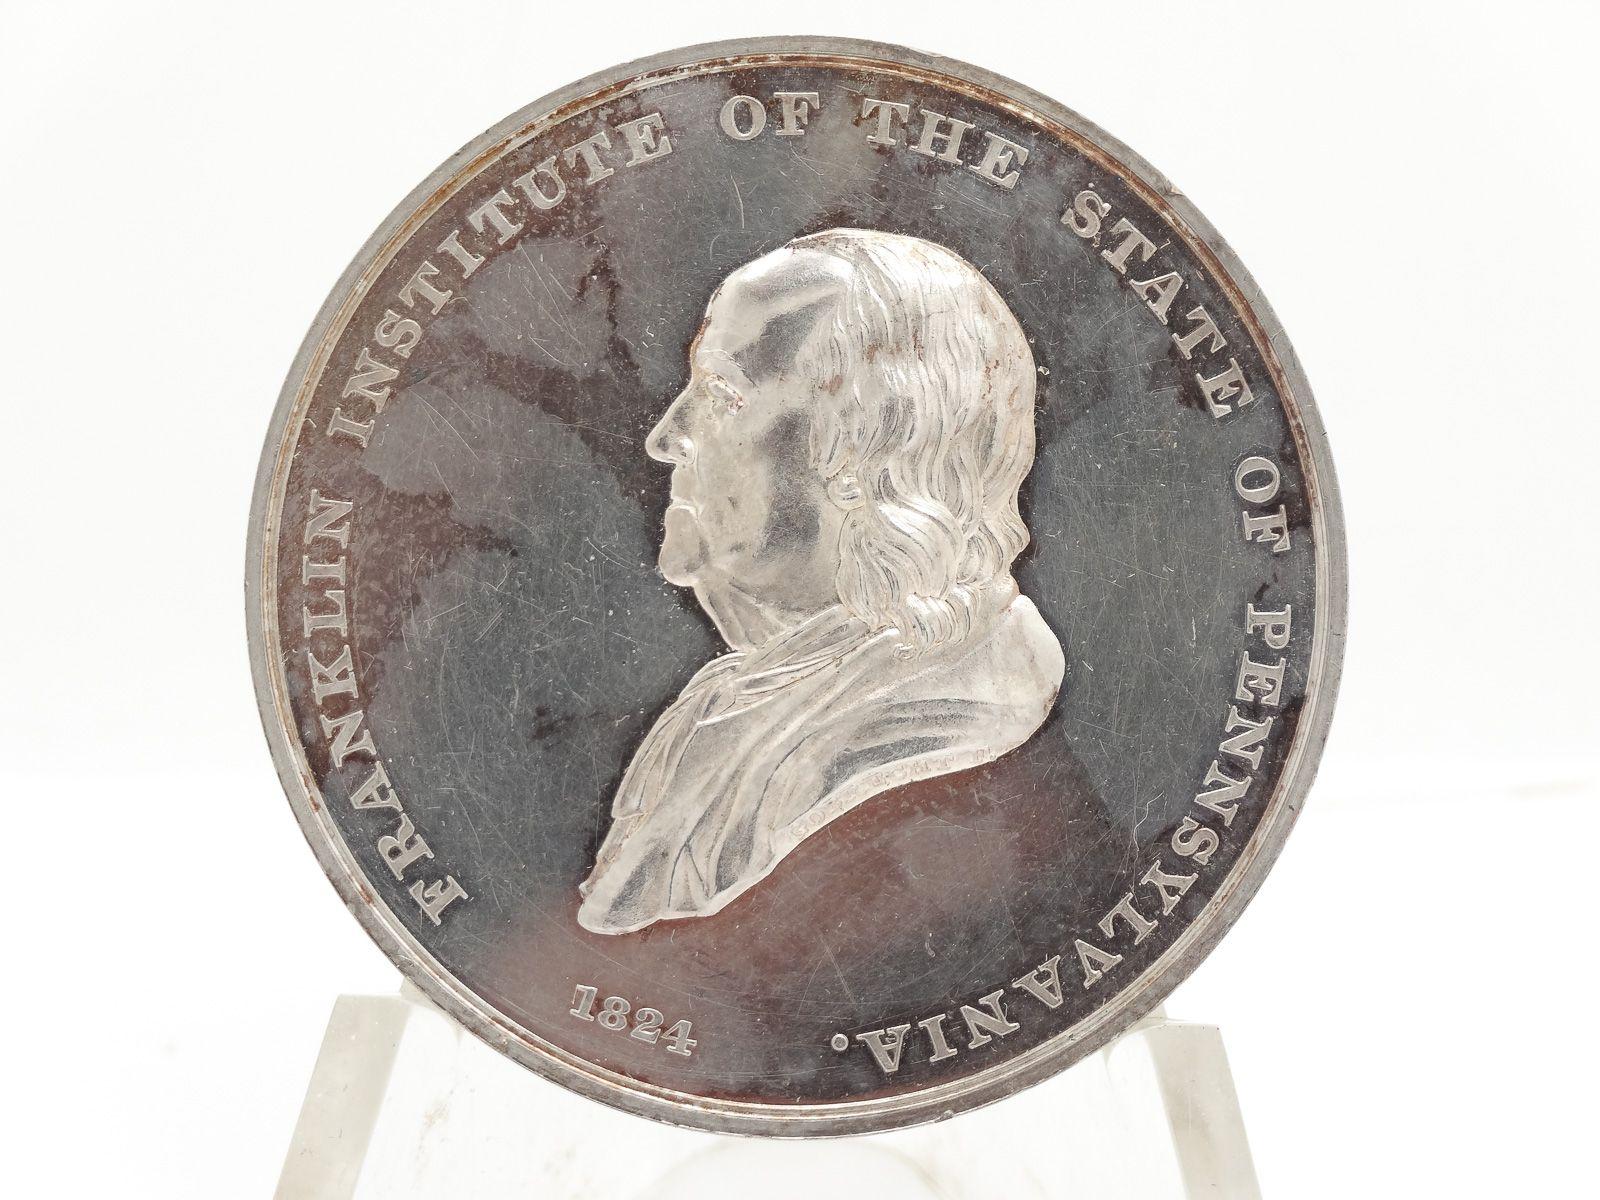 1827-Franklin-Institute-Reward-of-Skill-Ingenuity-Silver-Medal-Gobrecht